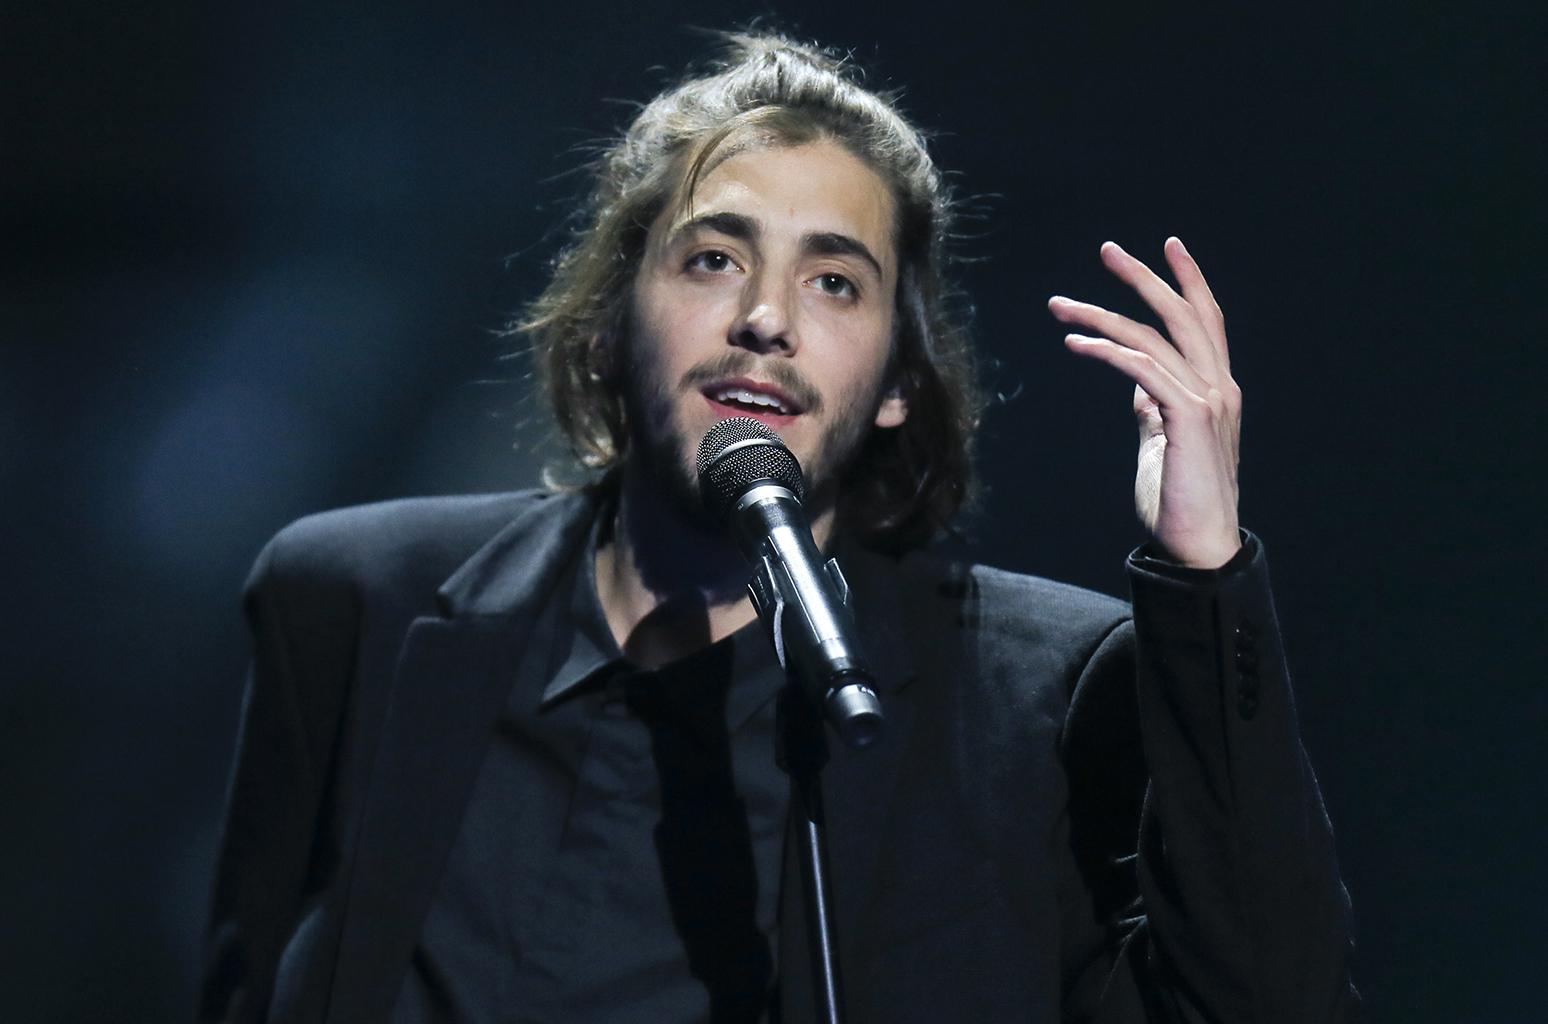 Salvador Sobral: Παντρεύτηκε ο νικητής της Eurovision 2017 ένα χρόνο μετά τη μεταμόσχευση καρδιάς   tlife.gr